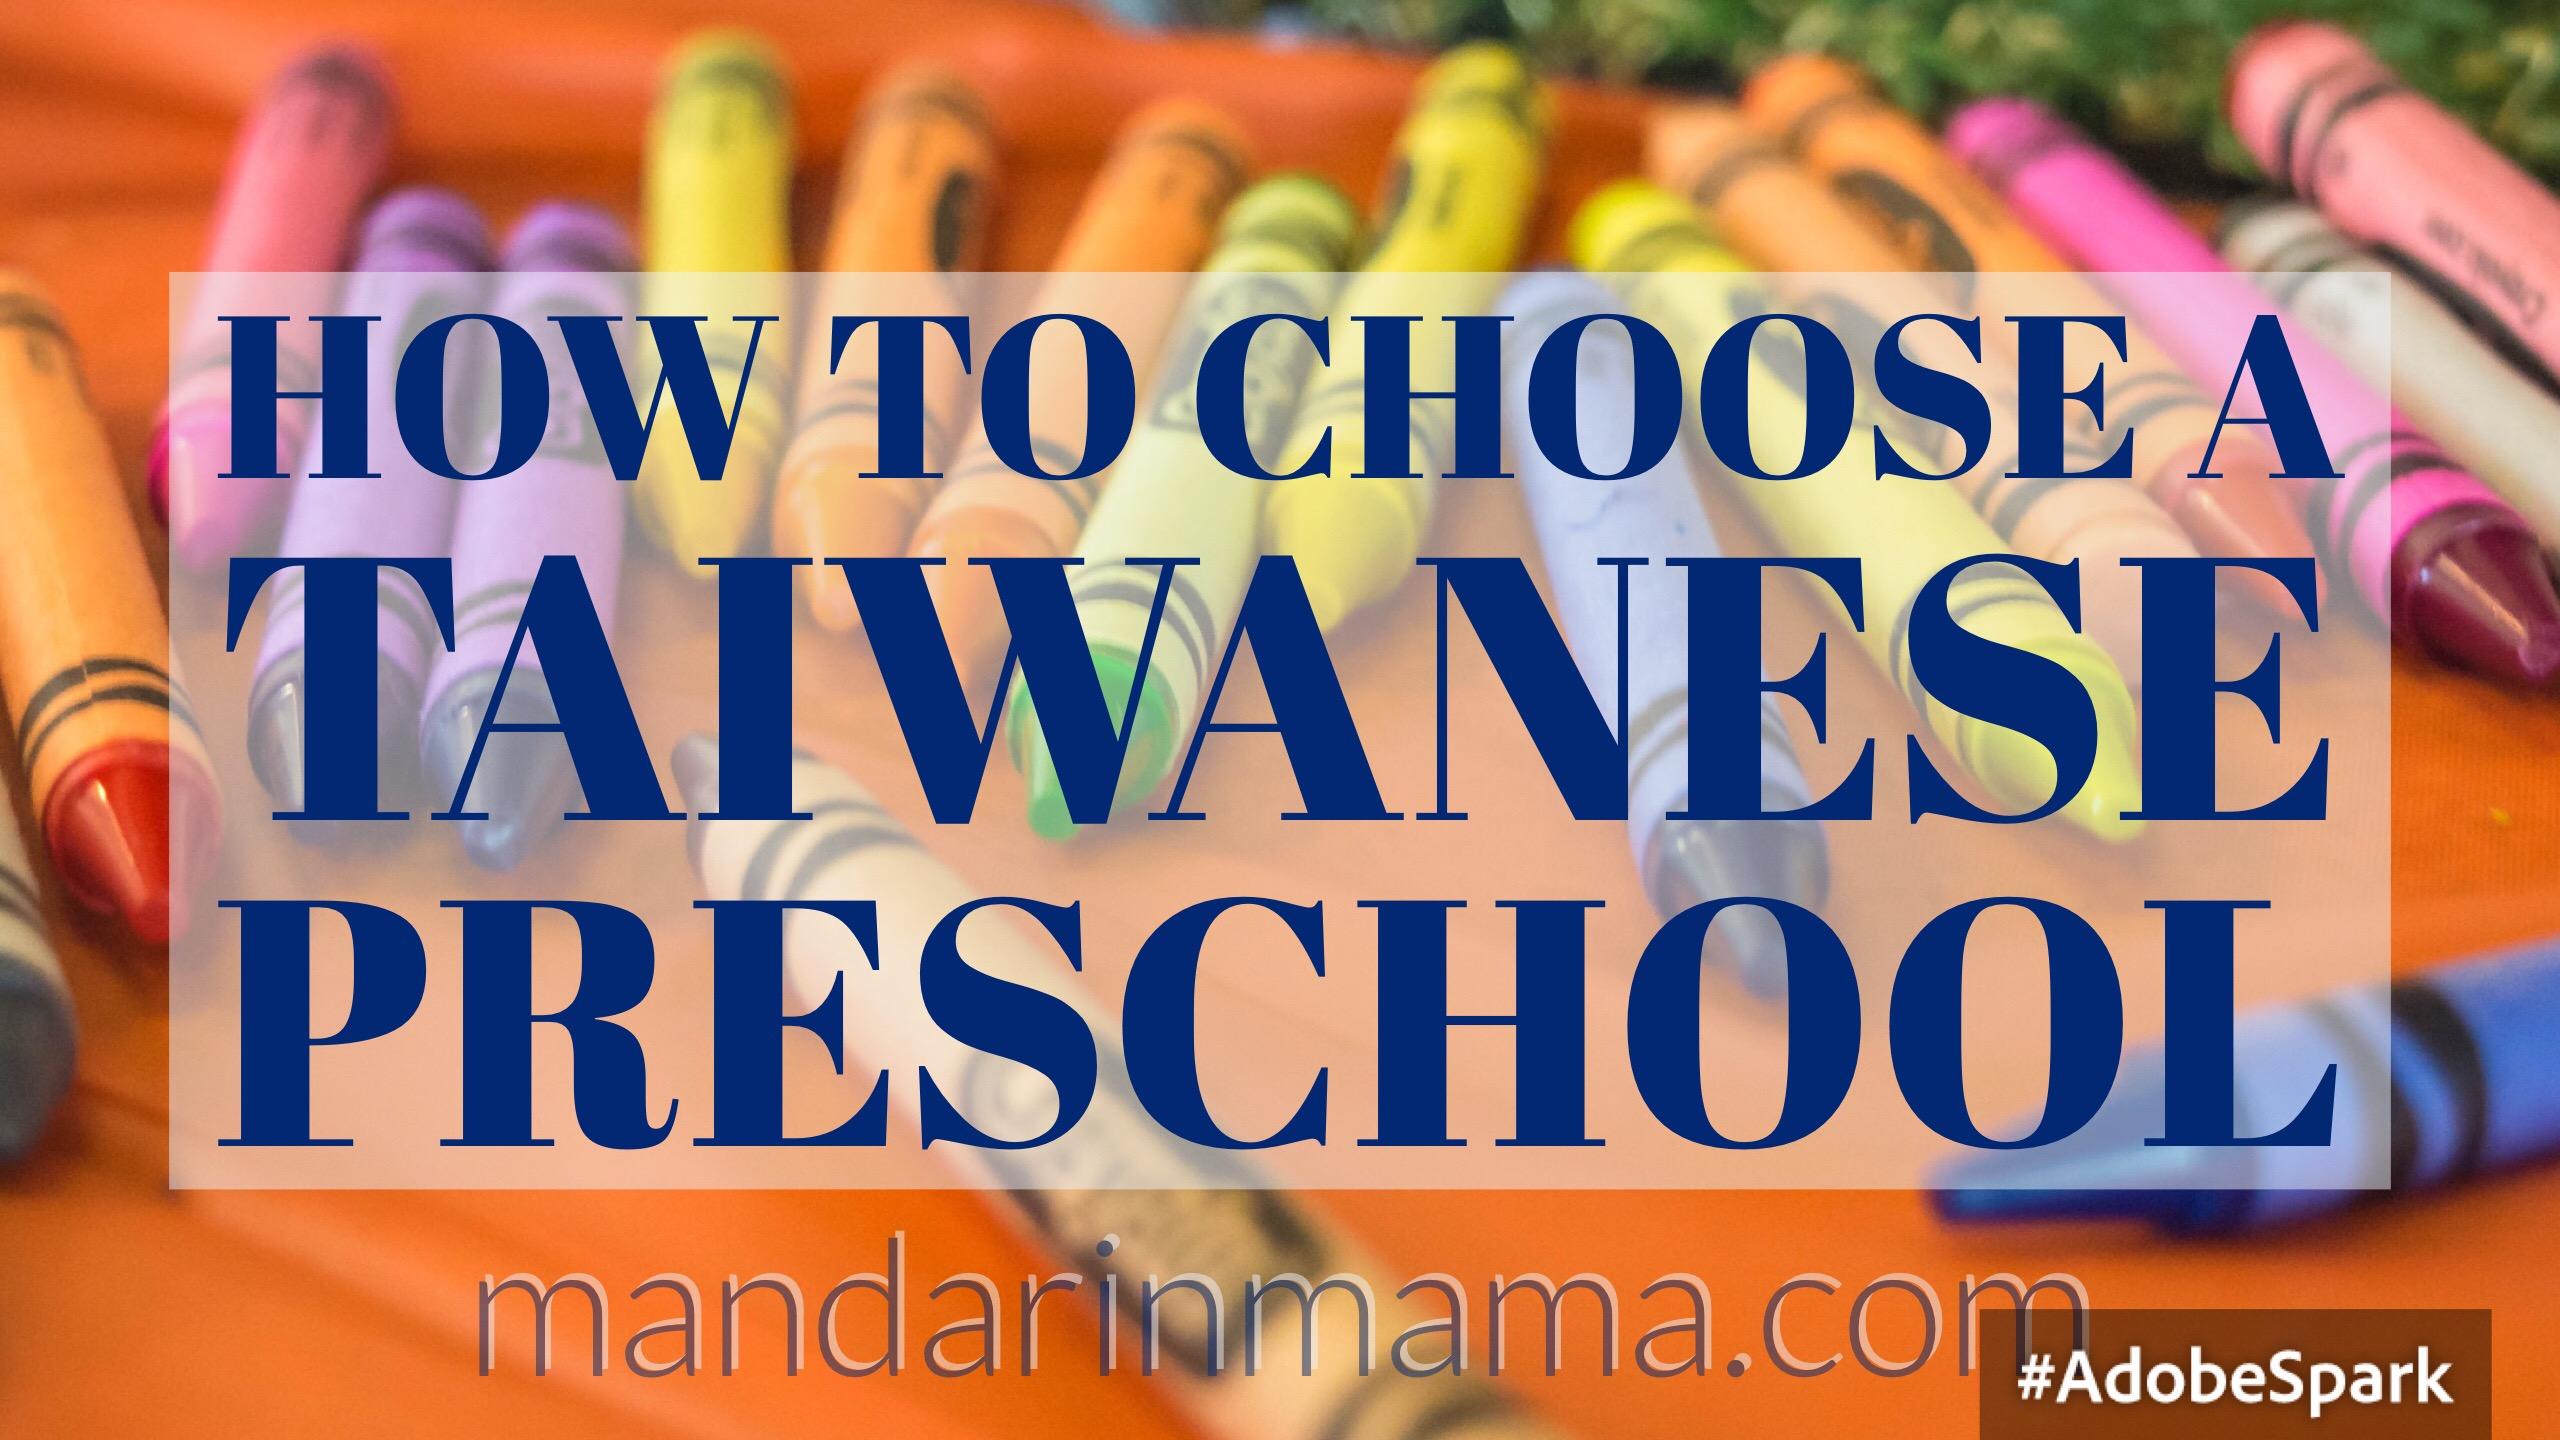 How to Choose a Taiwanese Preschool